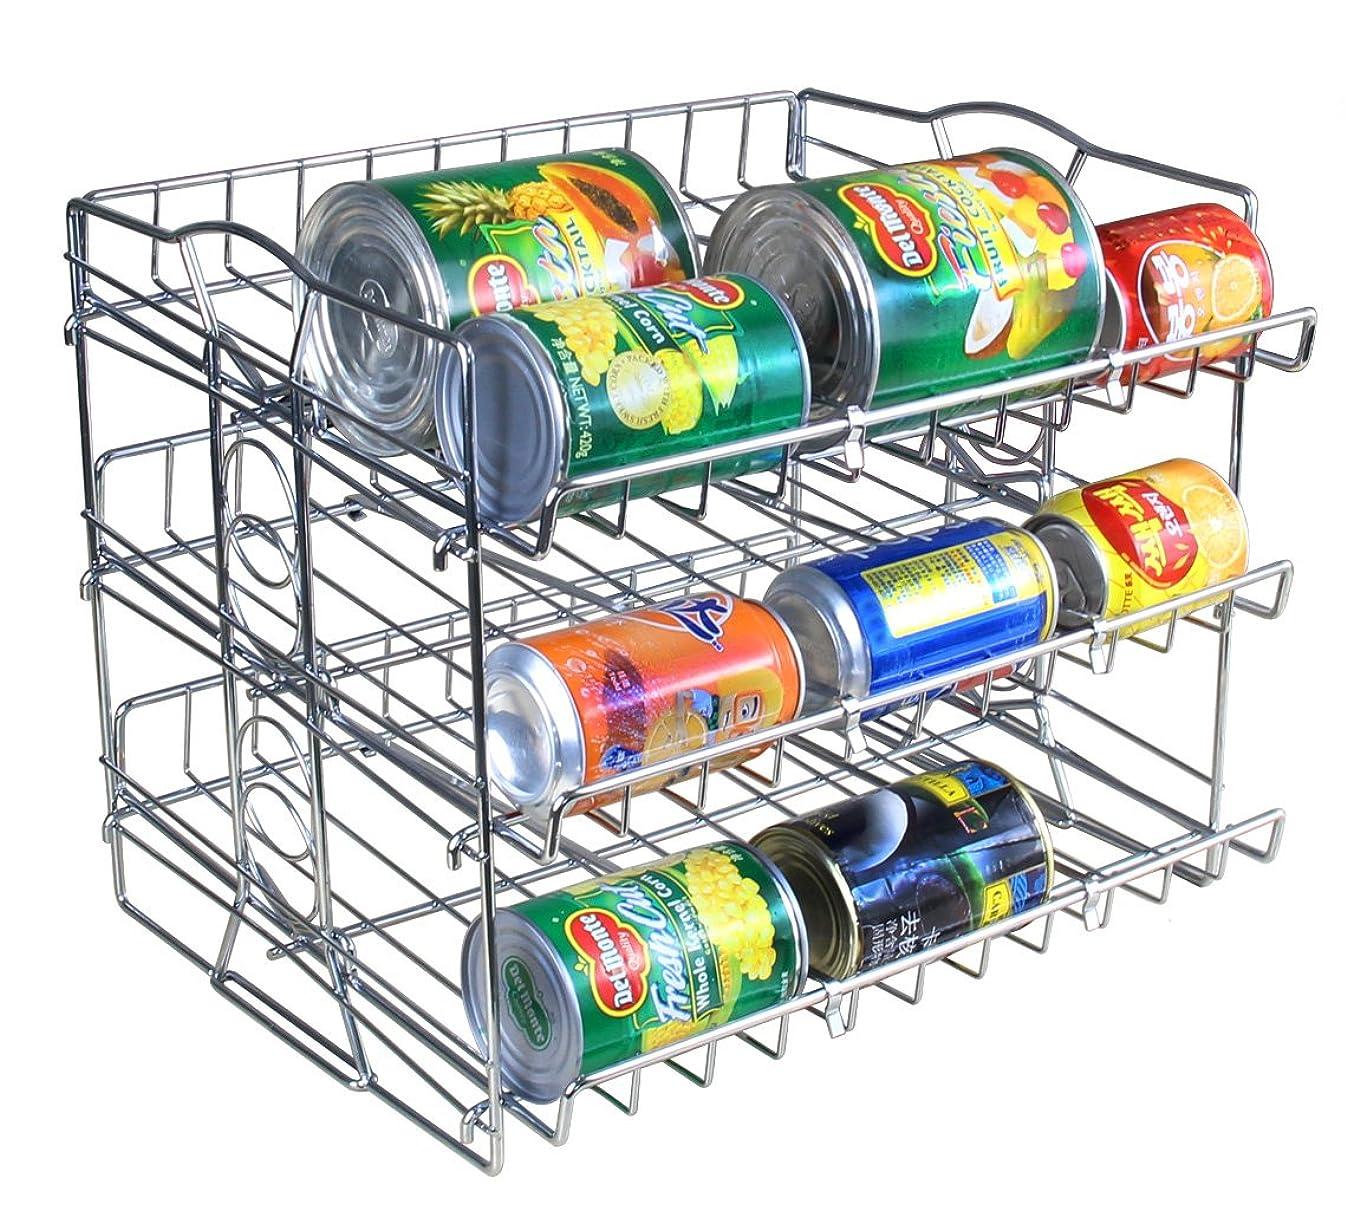 Kitchen 3 Tier Stackable Can Rack Organizer